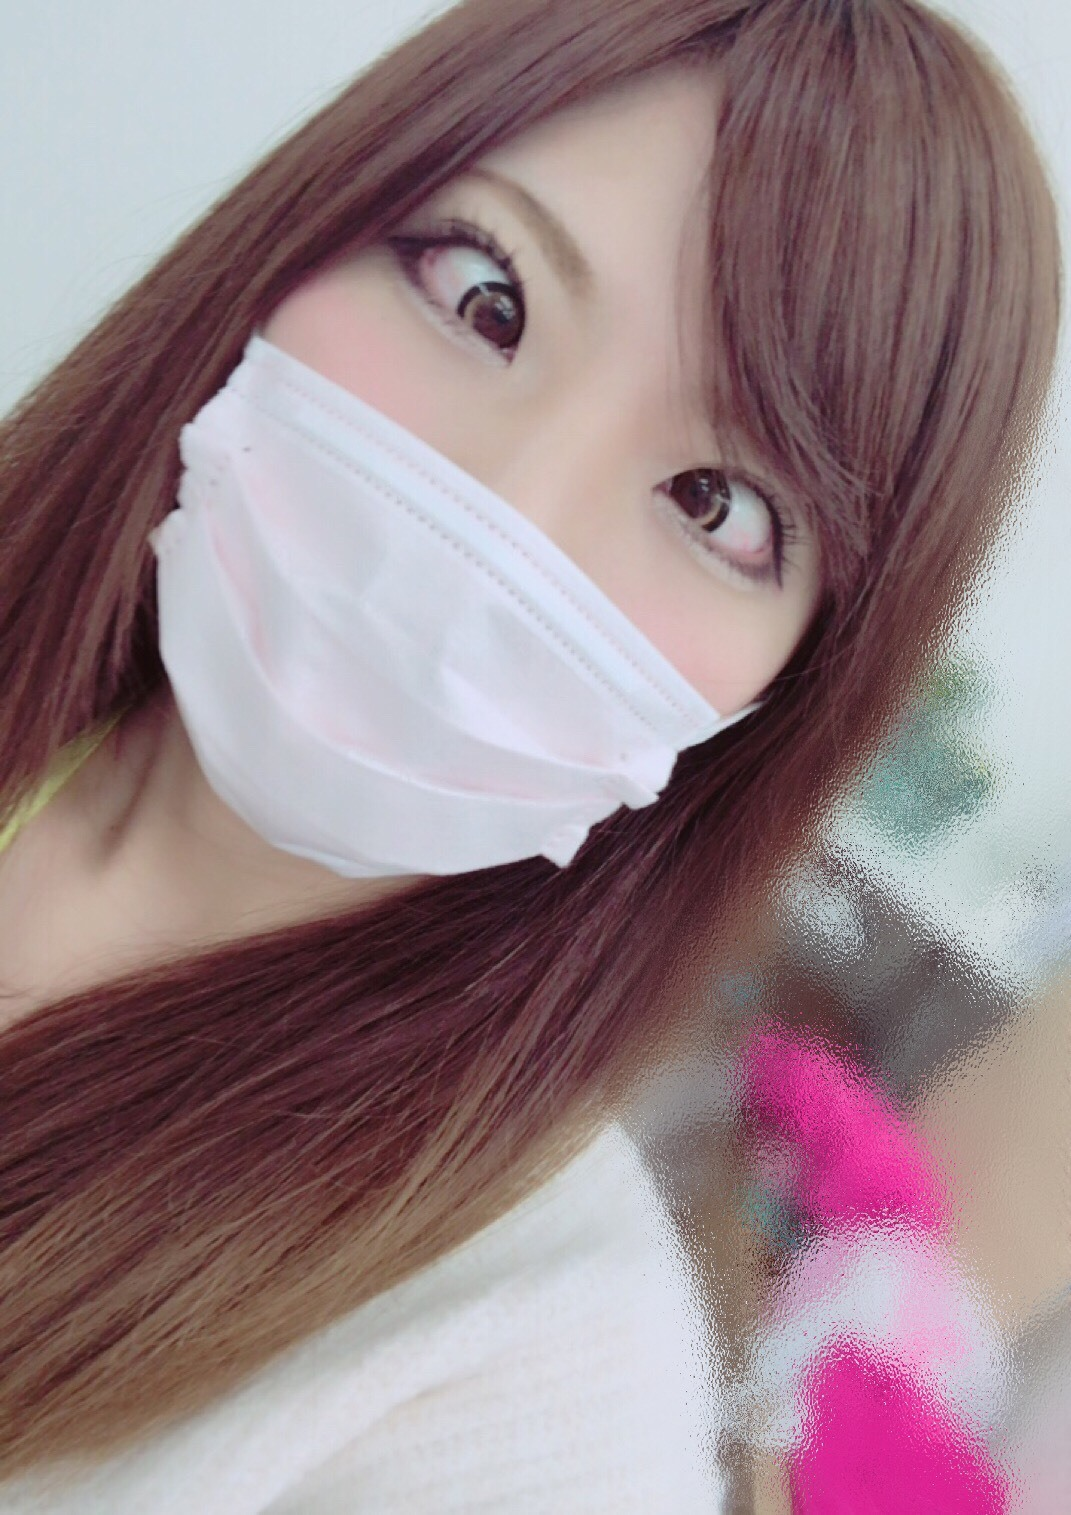 S__1187850.jpg